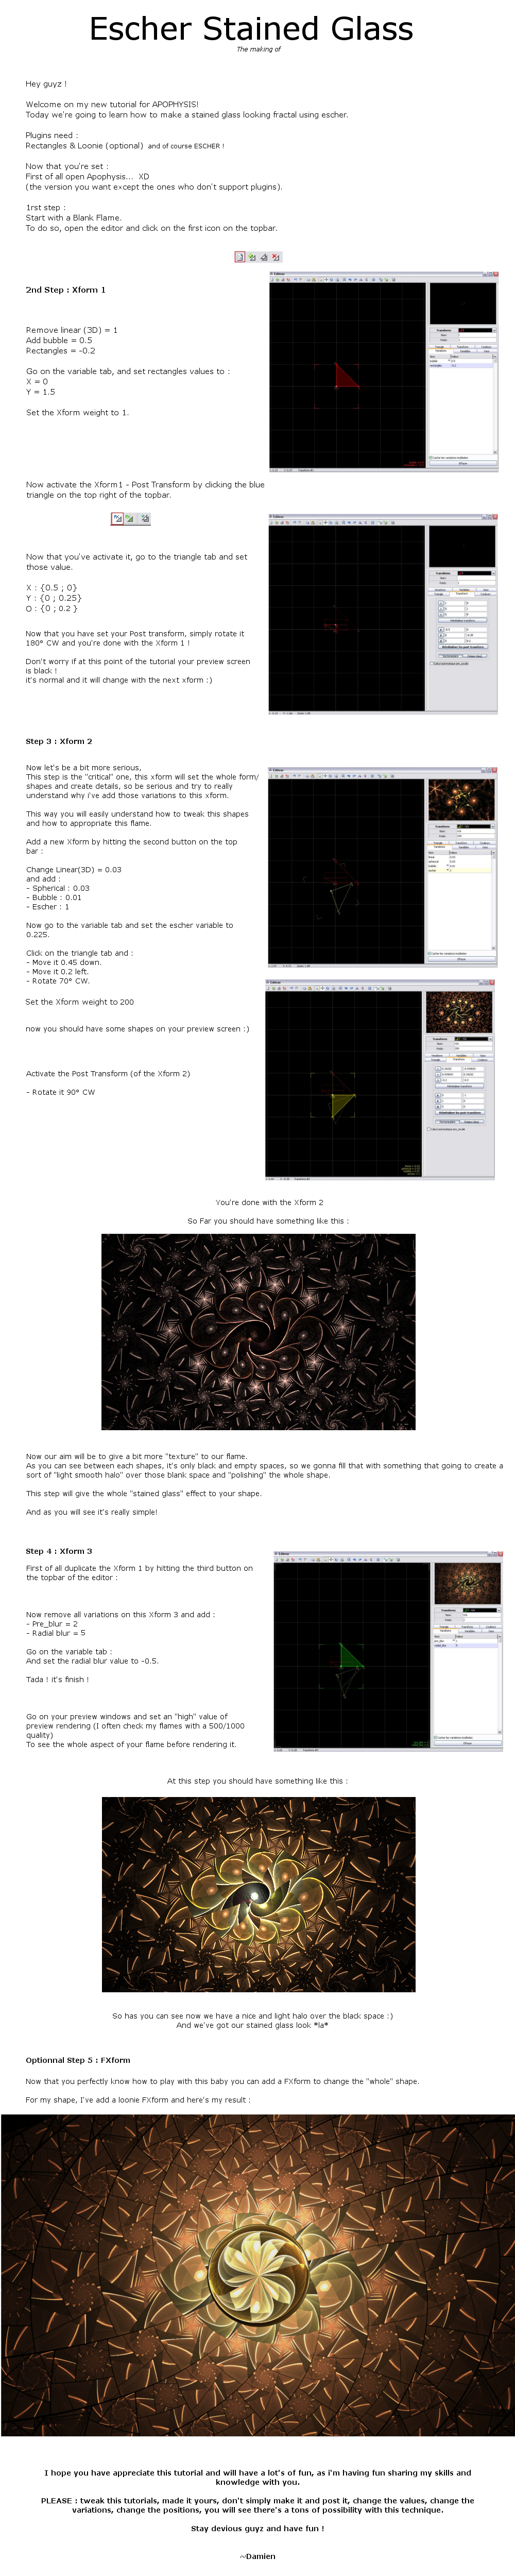 Tutorial - Escher StainedGlass by SaTaNiA